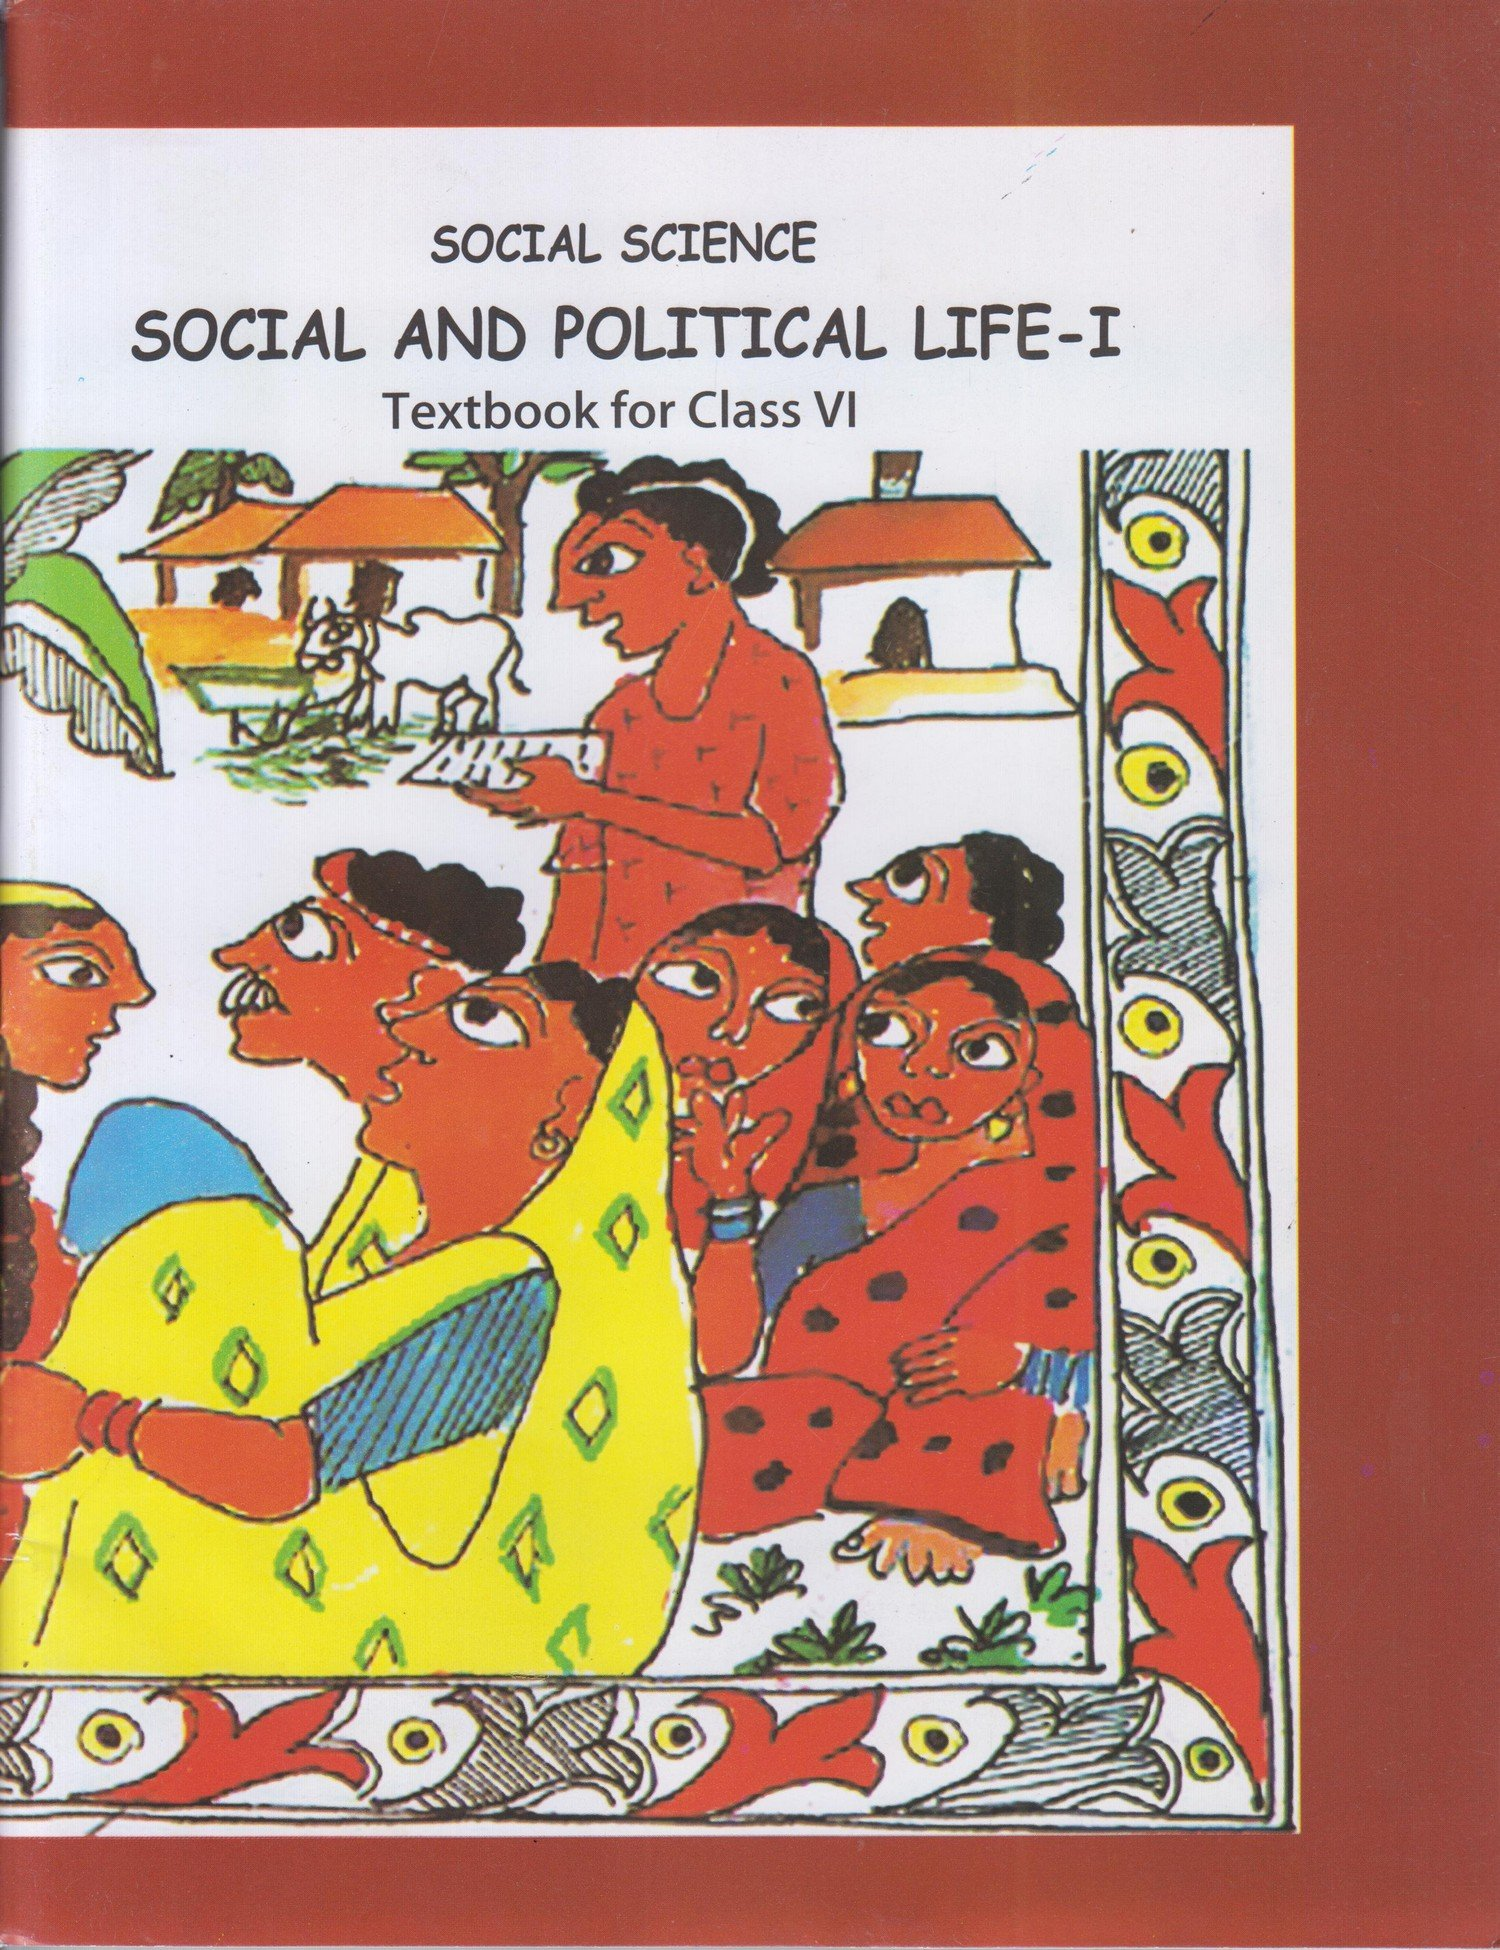 NCERT Social Science (Social and Political Life-1) Class-VI